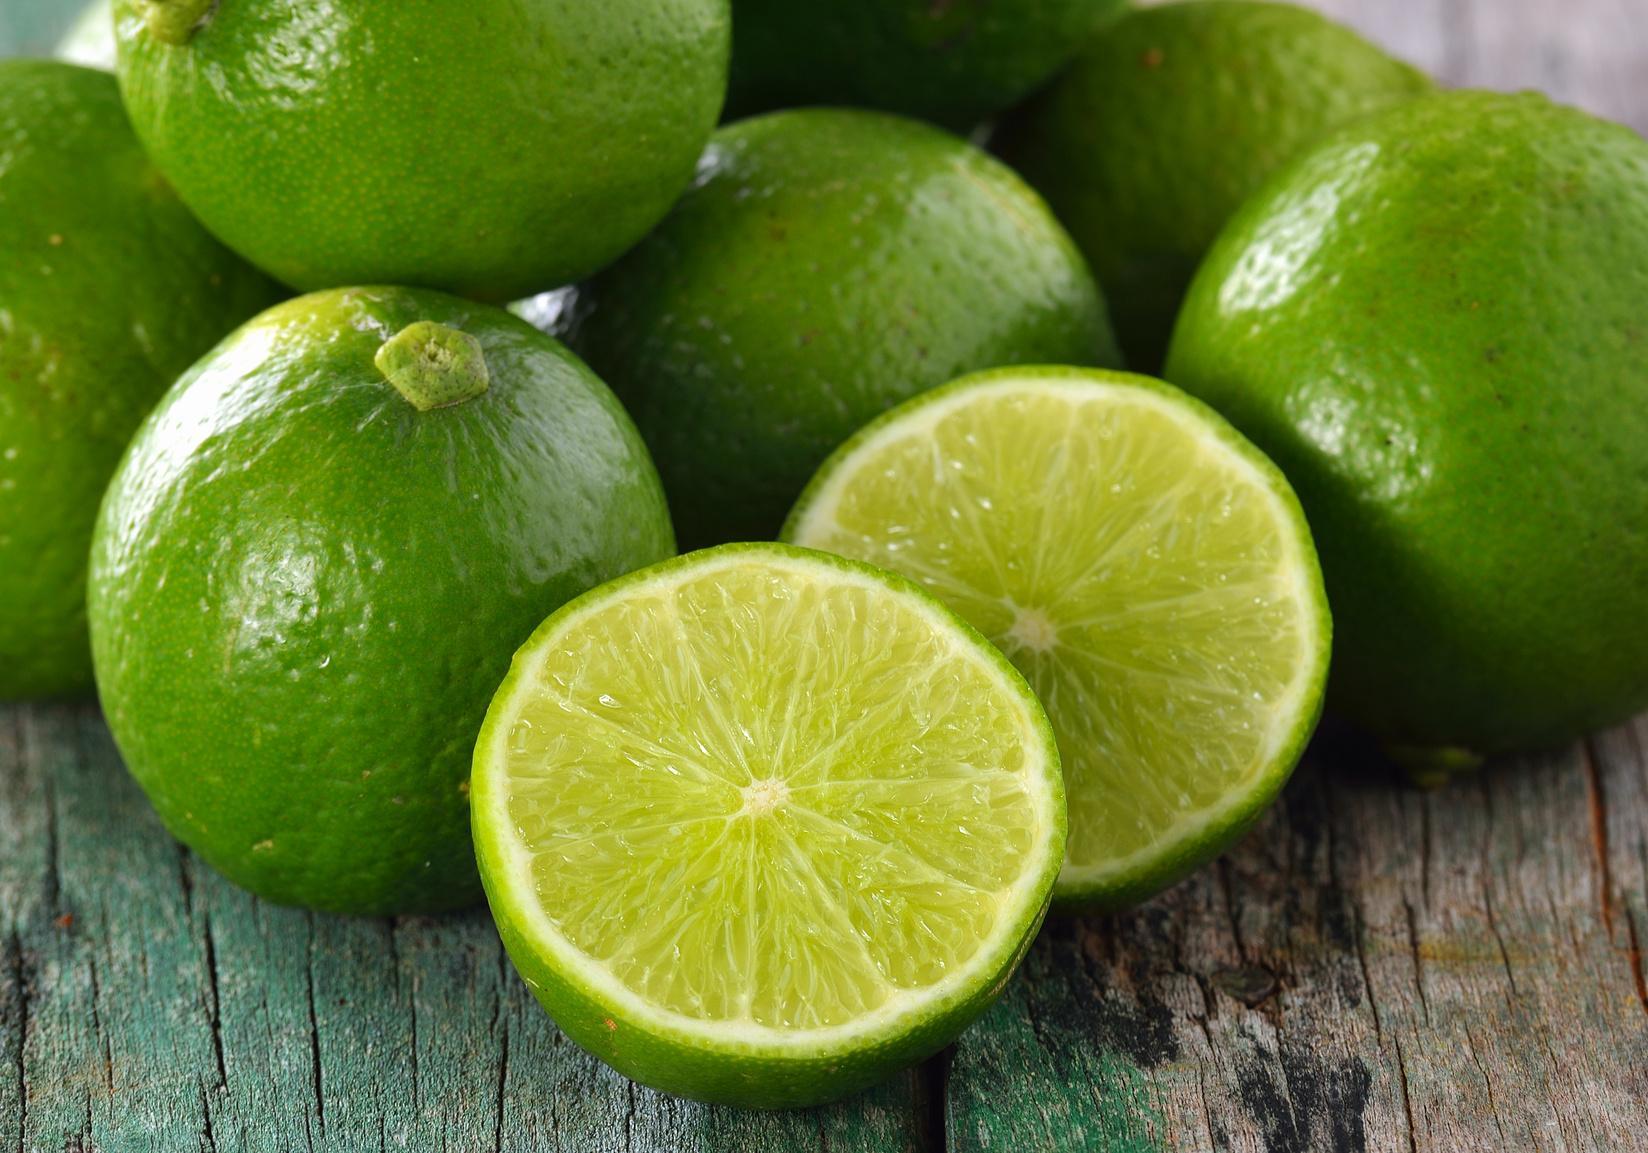 recettes citron vert cuisine madame figaro. Black Bedroom Furniture Sets. Home Design Ideas